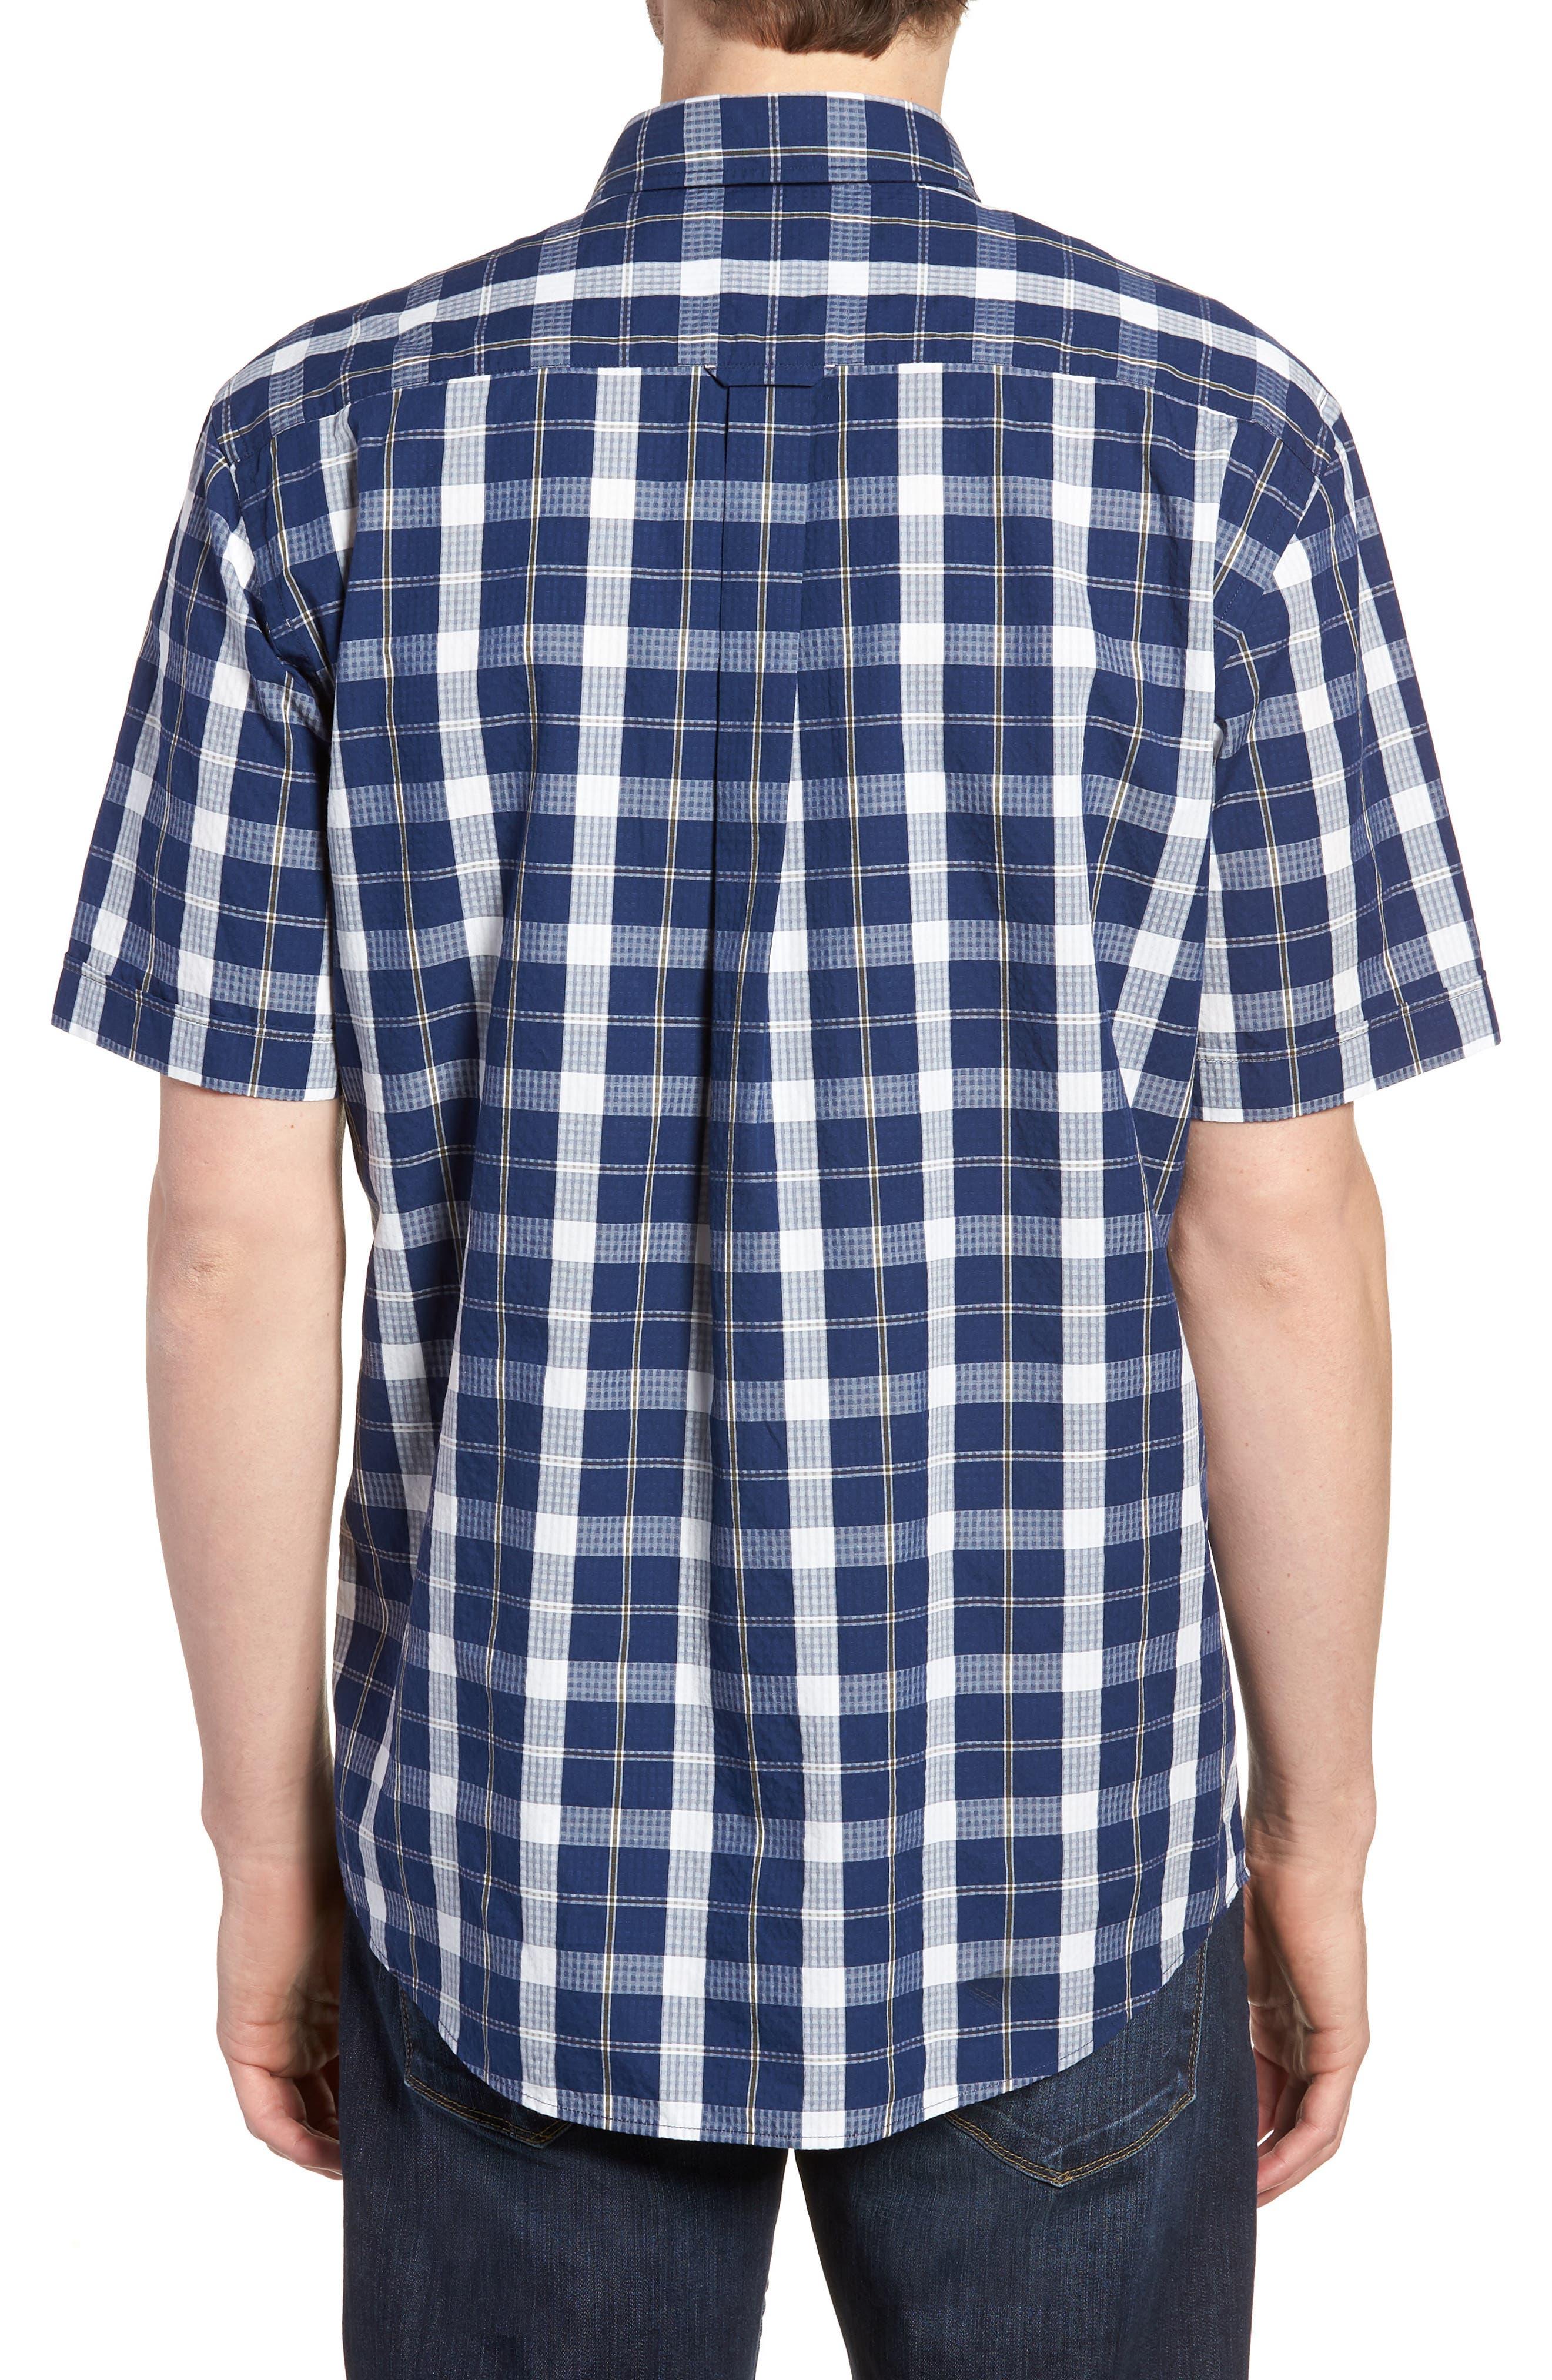 Bradford Regular Fit Sport Shirt,                             Alternate thumbnail 3, color,                             Navy